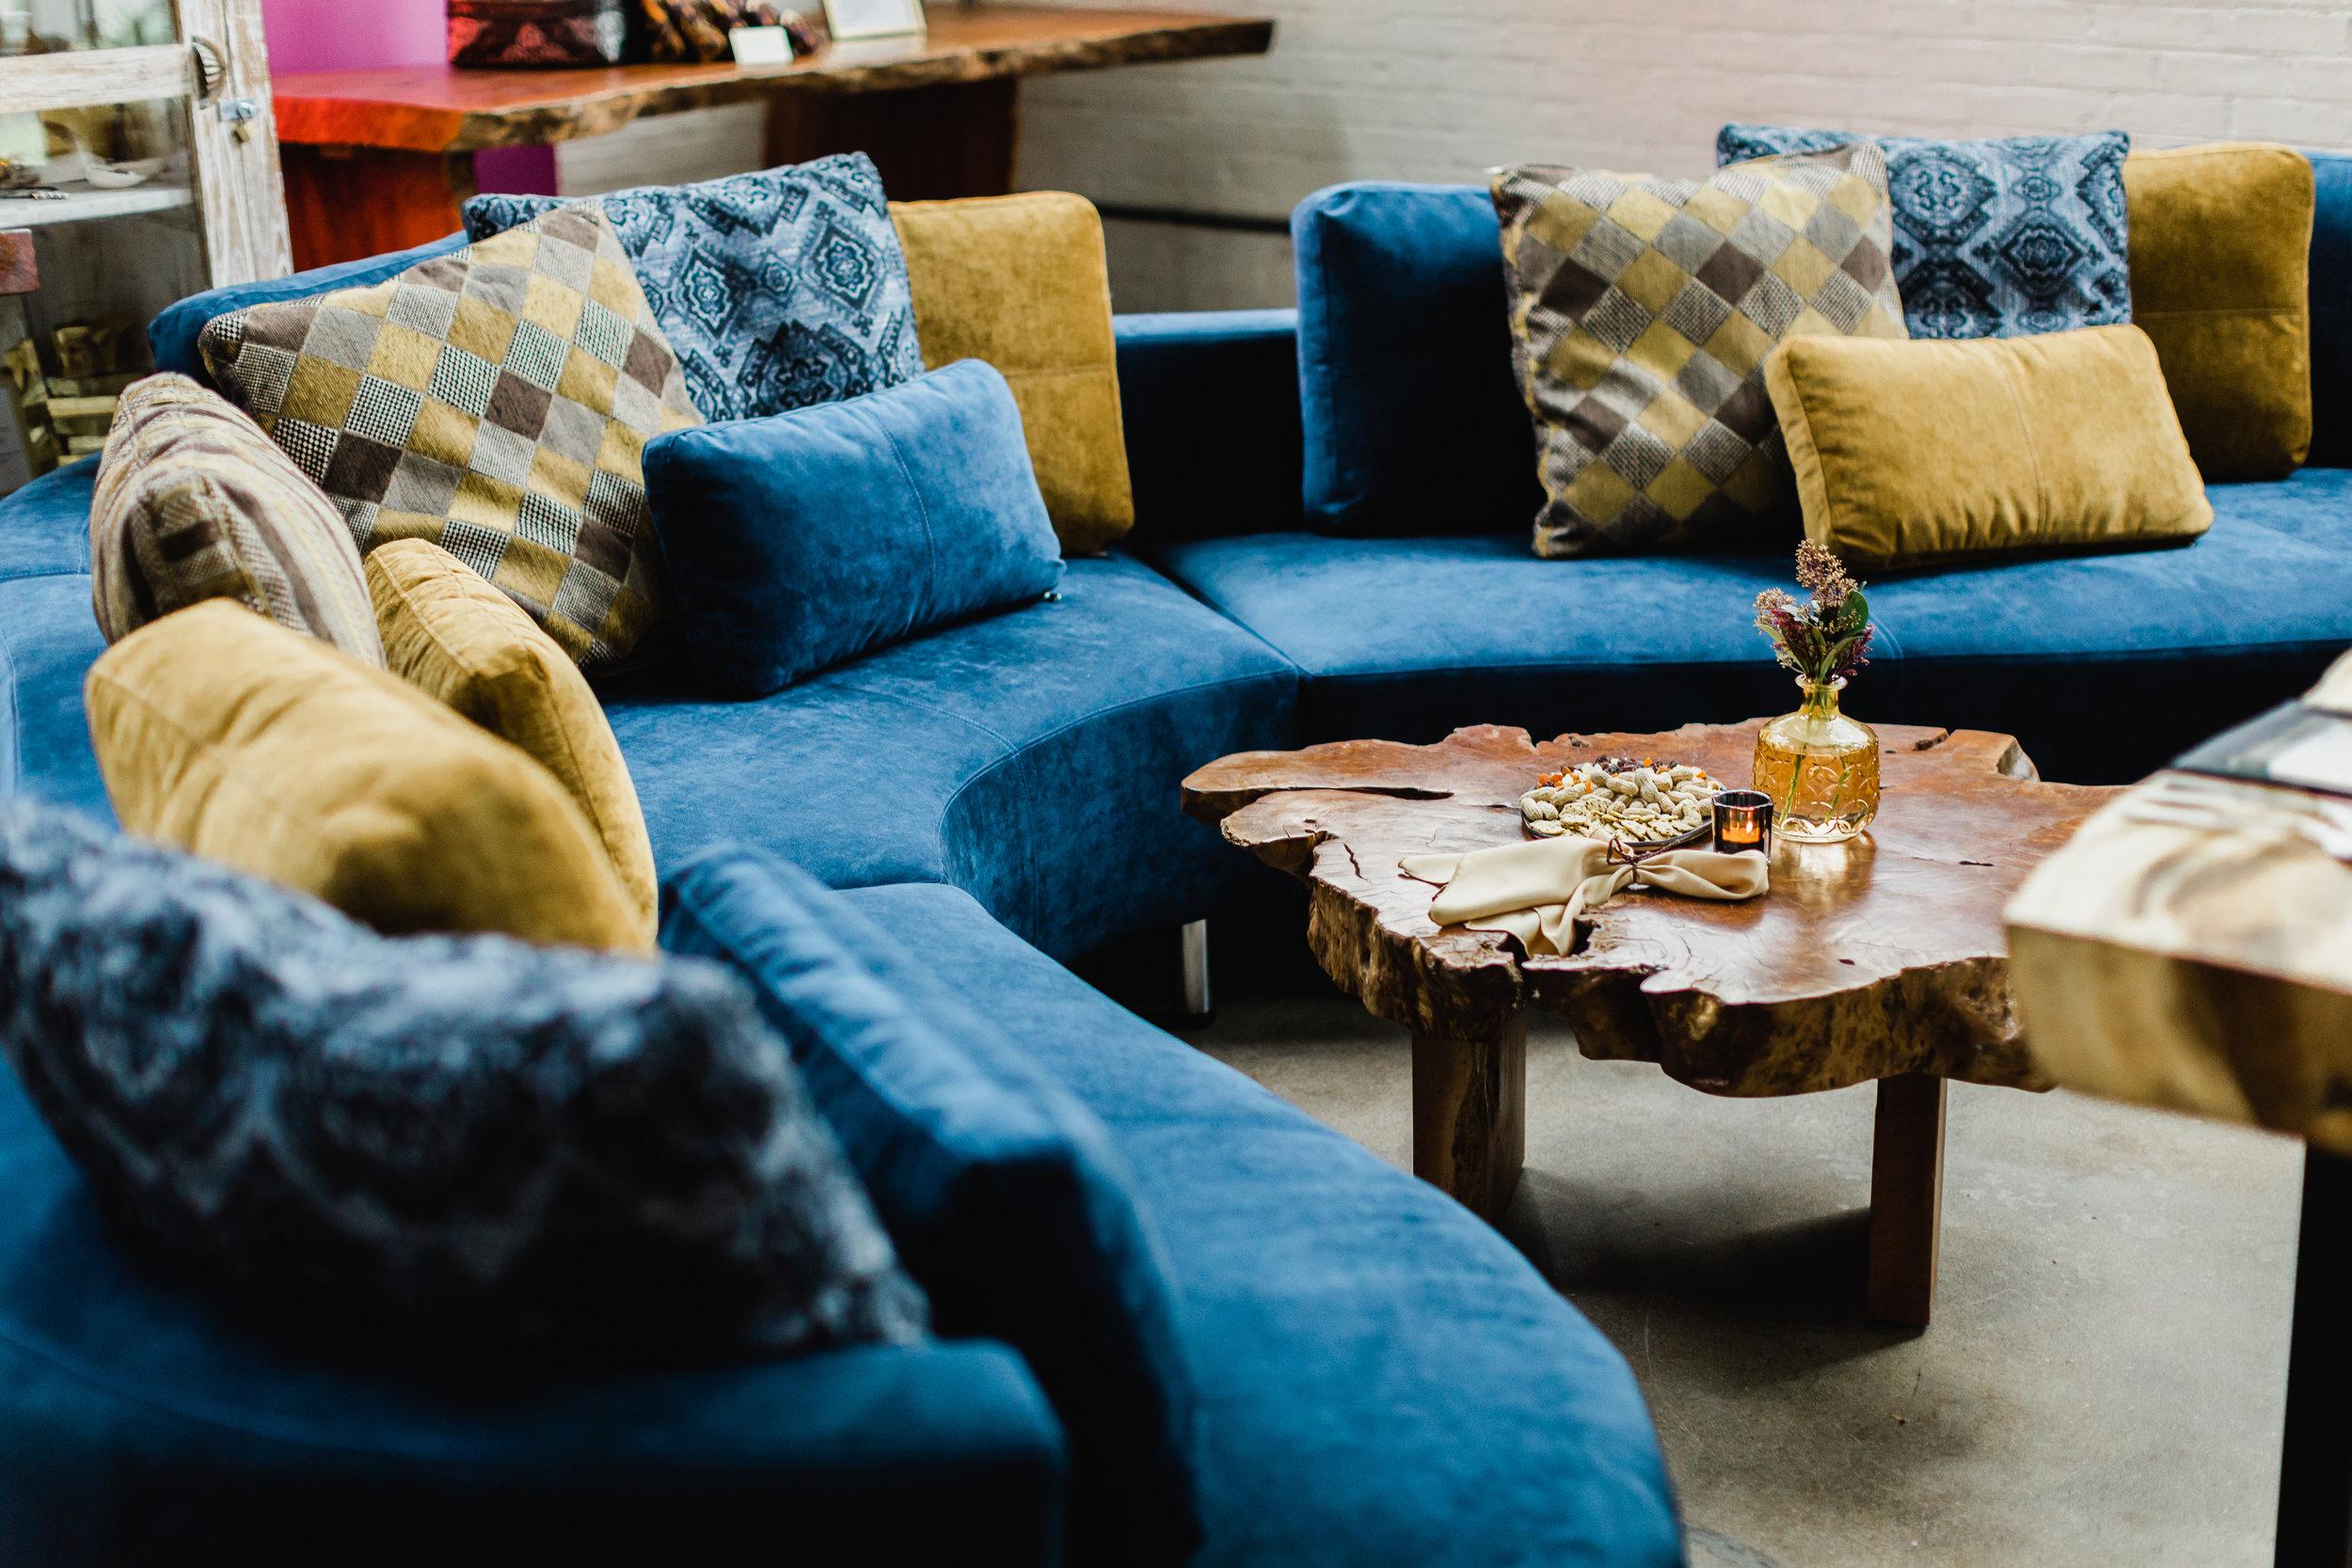 thanksgiving sectional. Blue Moon Furniture. 2018-10-03_ThanksgivingInspiration_FrenchAccentDesign75.jpg